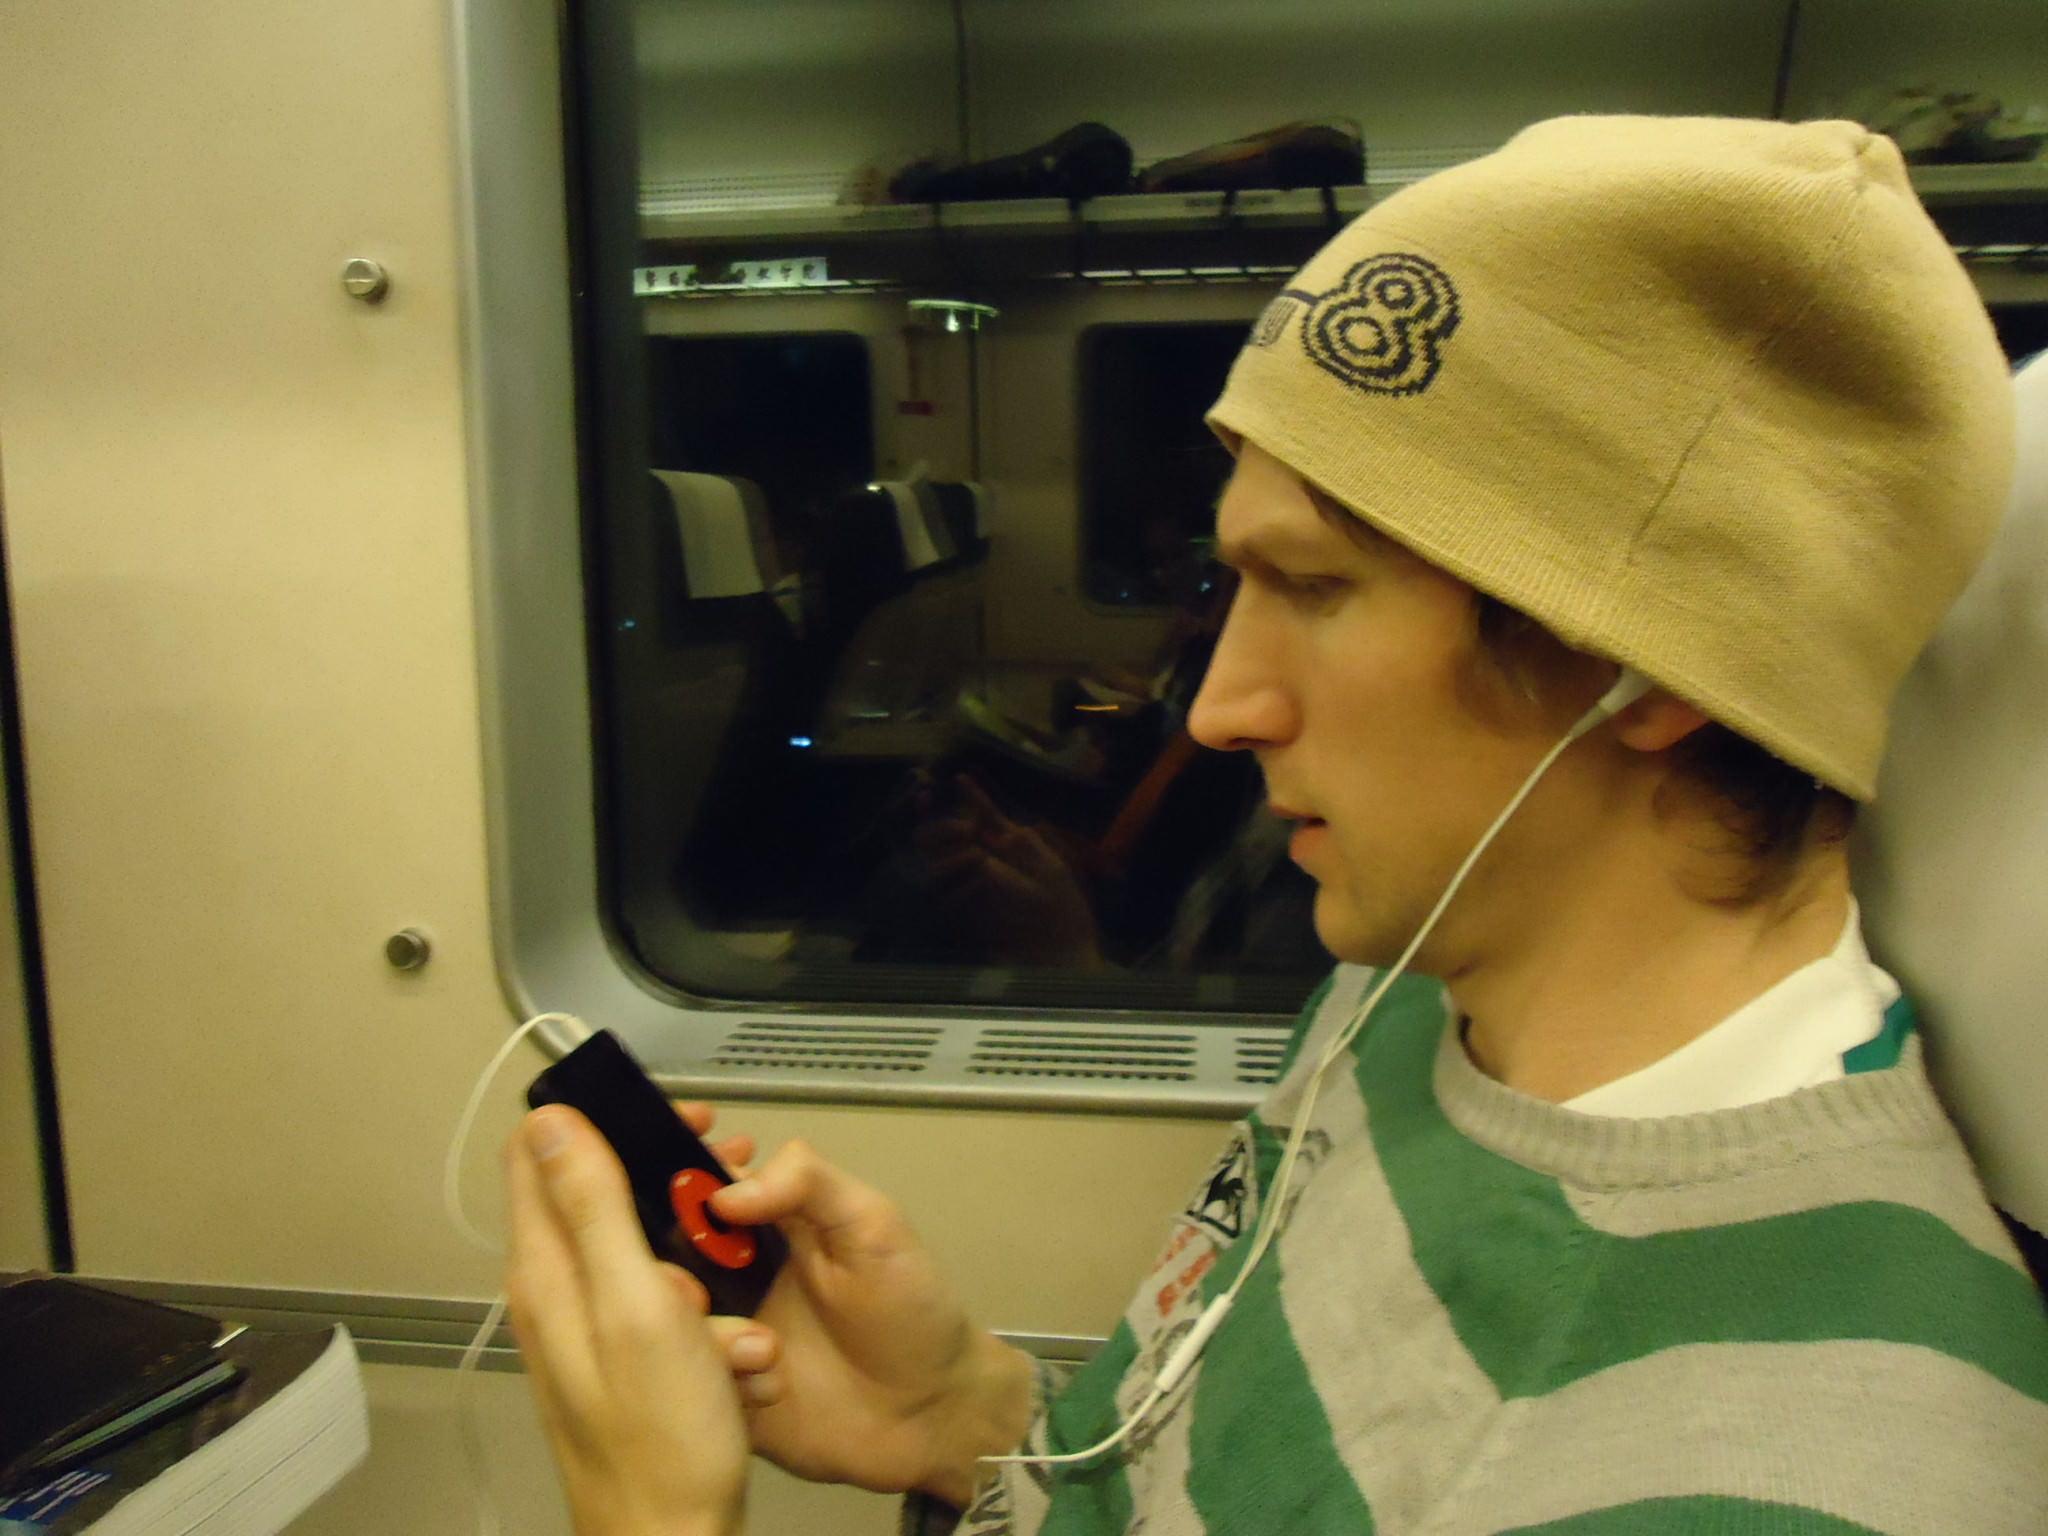 Jonny Blair using his iPod in China